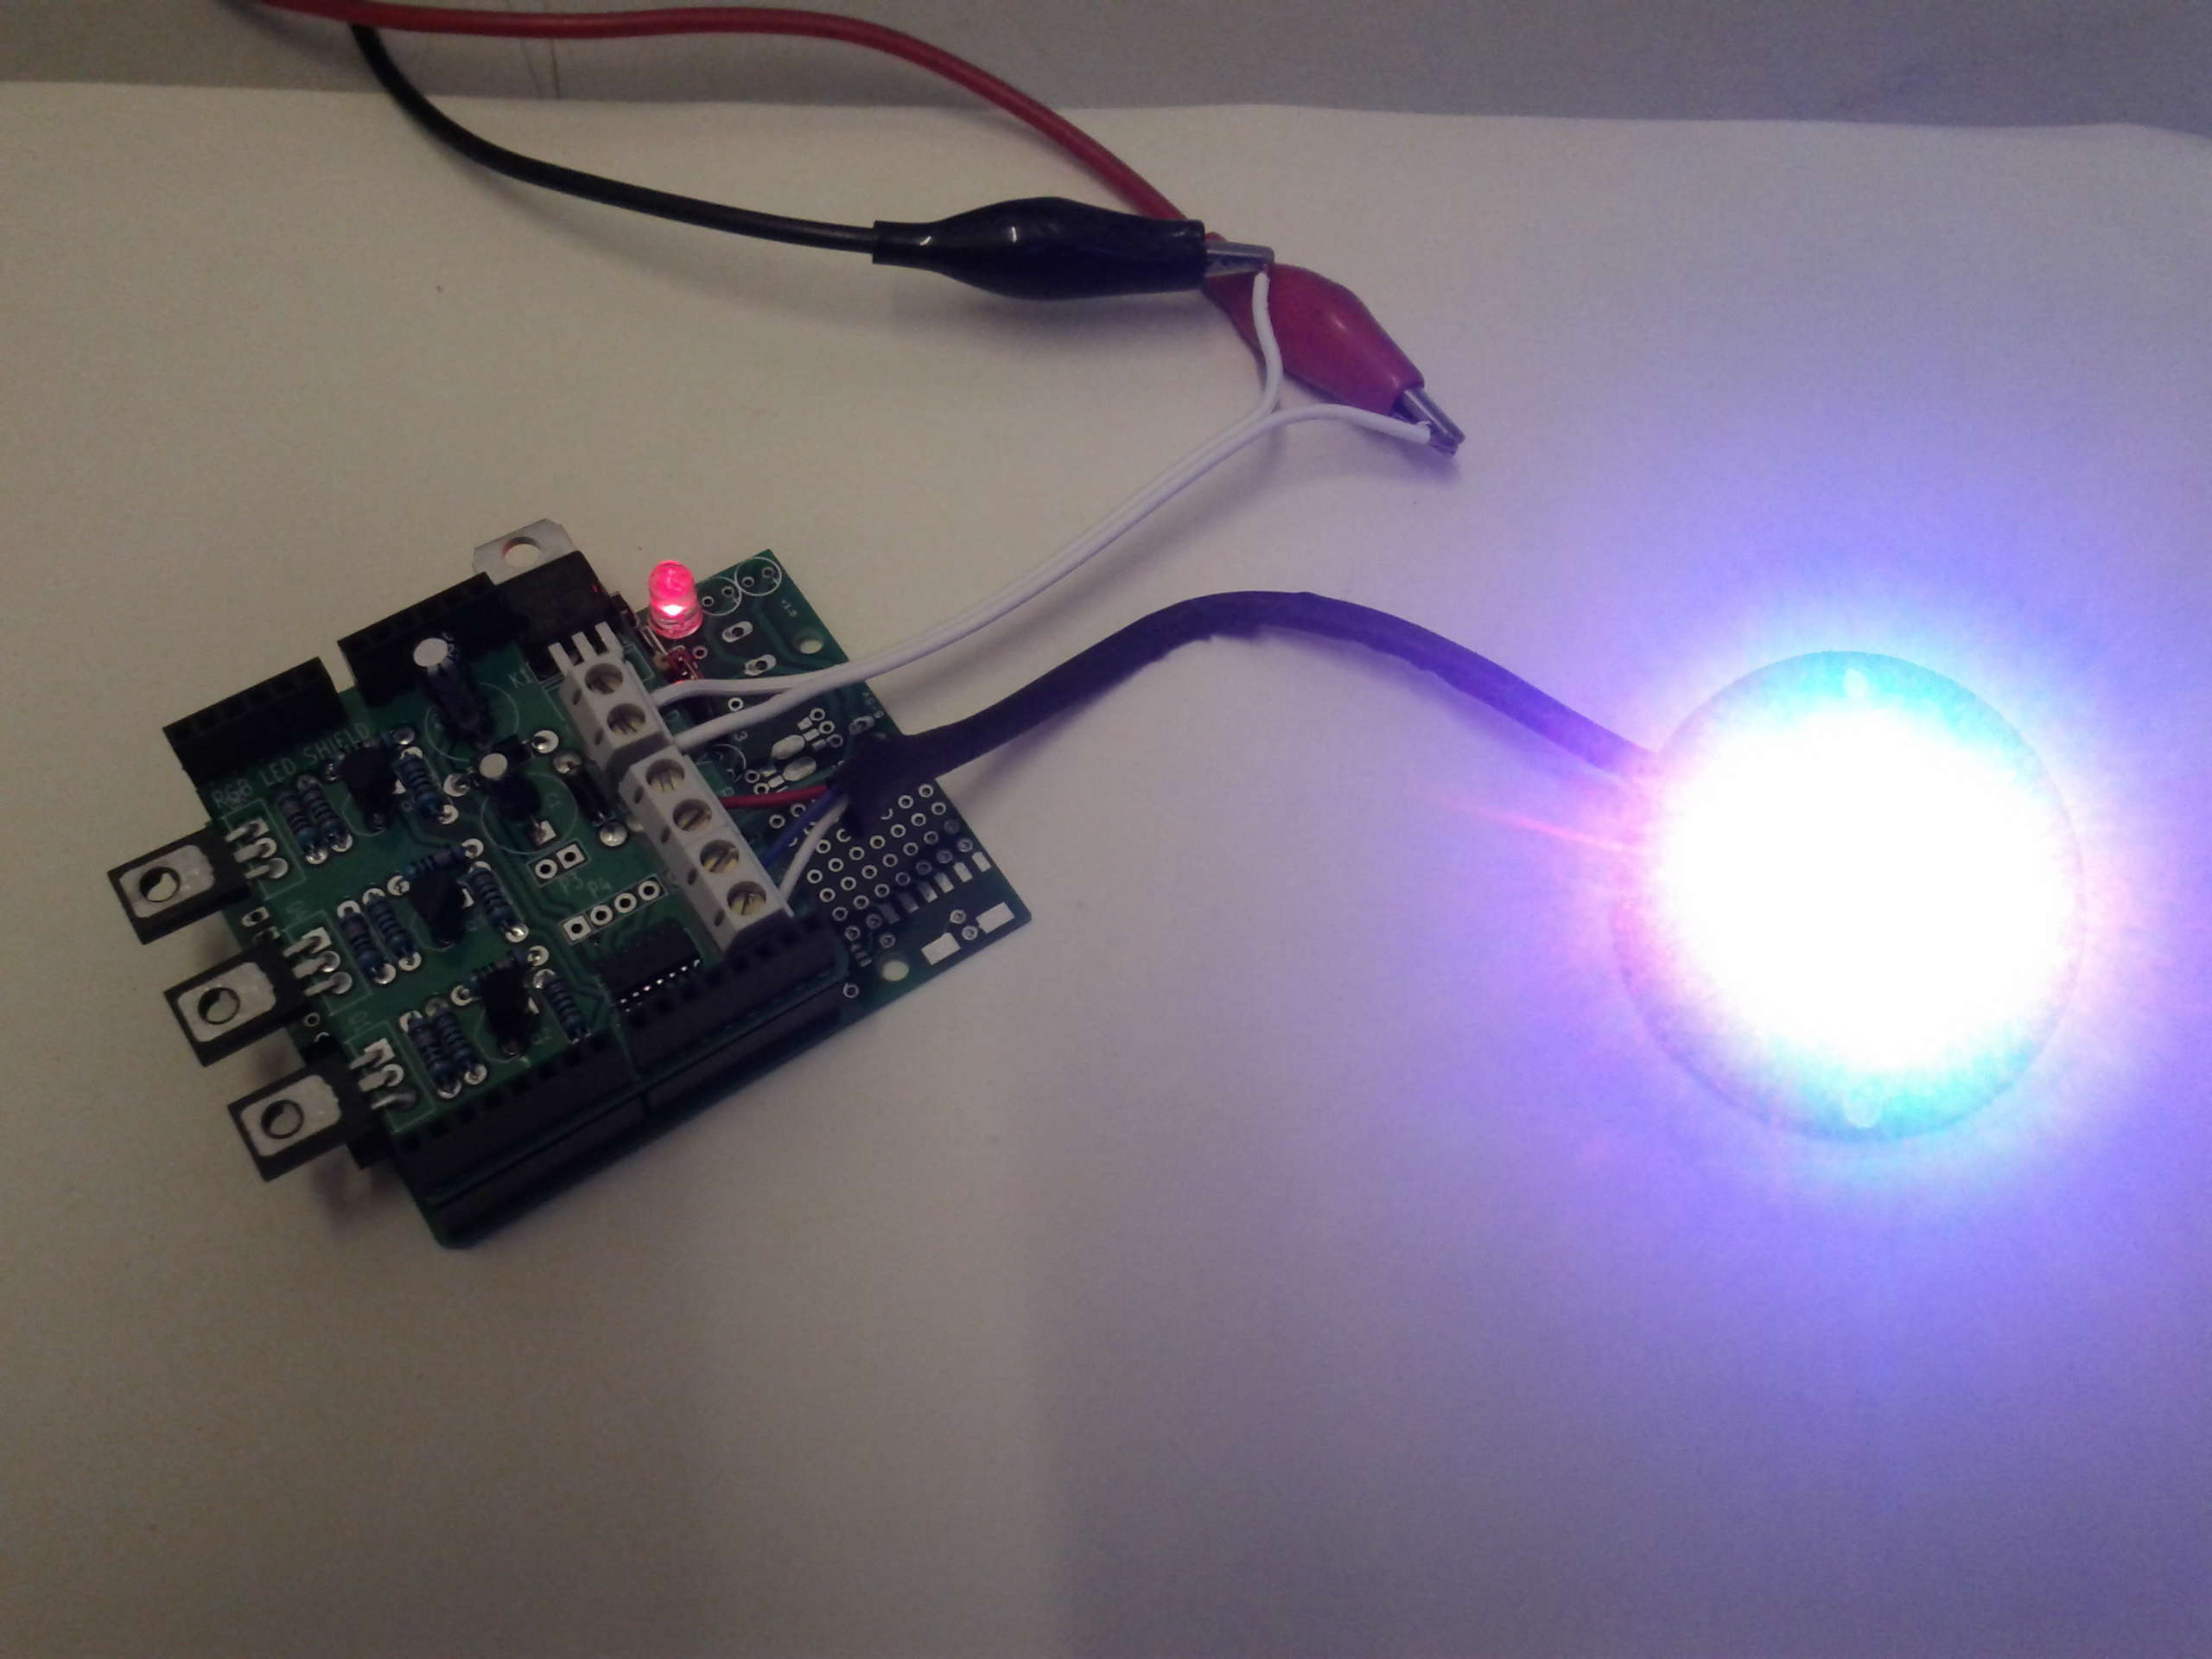 Rgb led arduino shield renewable energy innovation